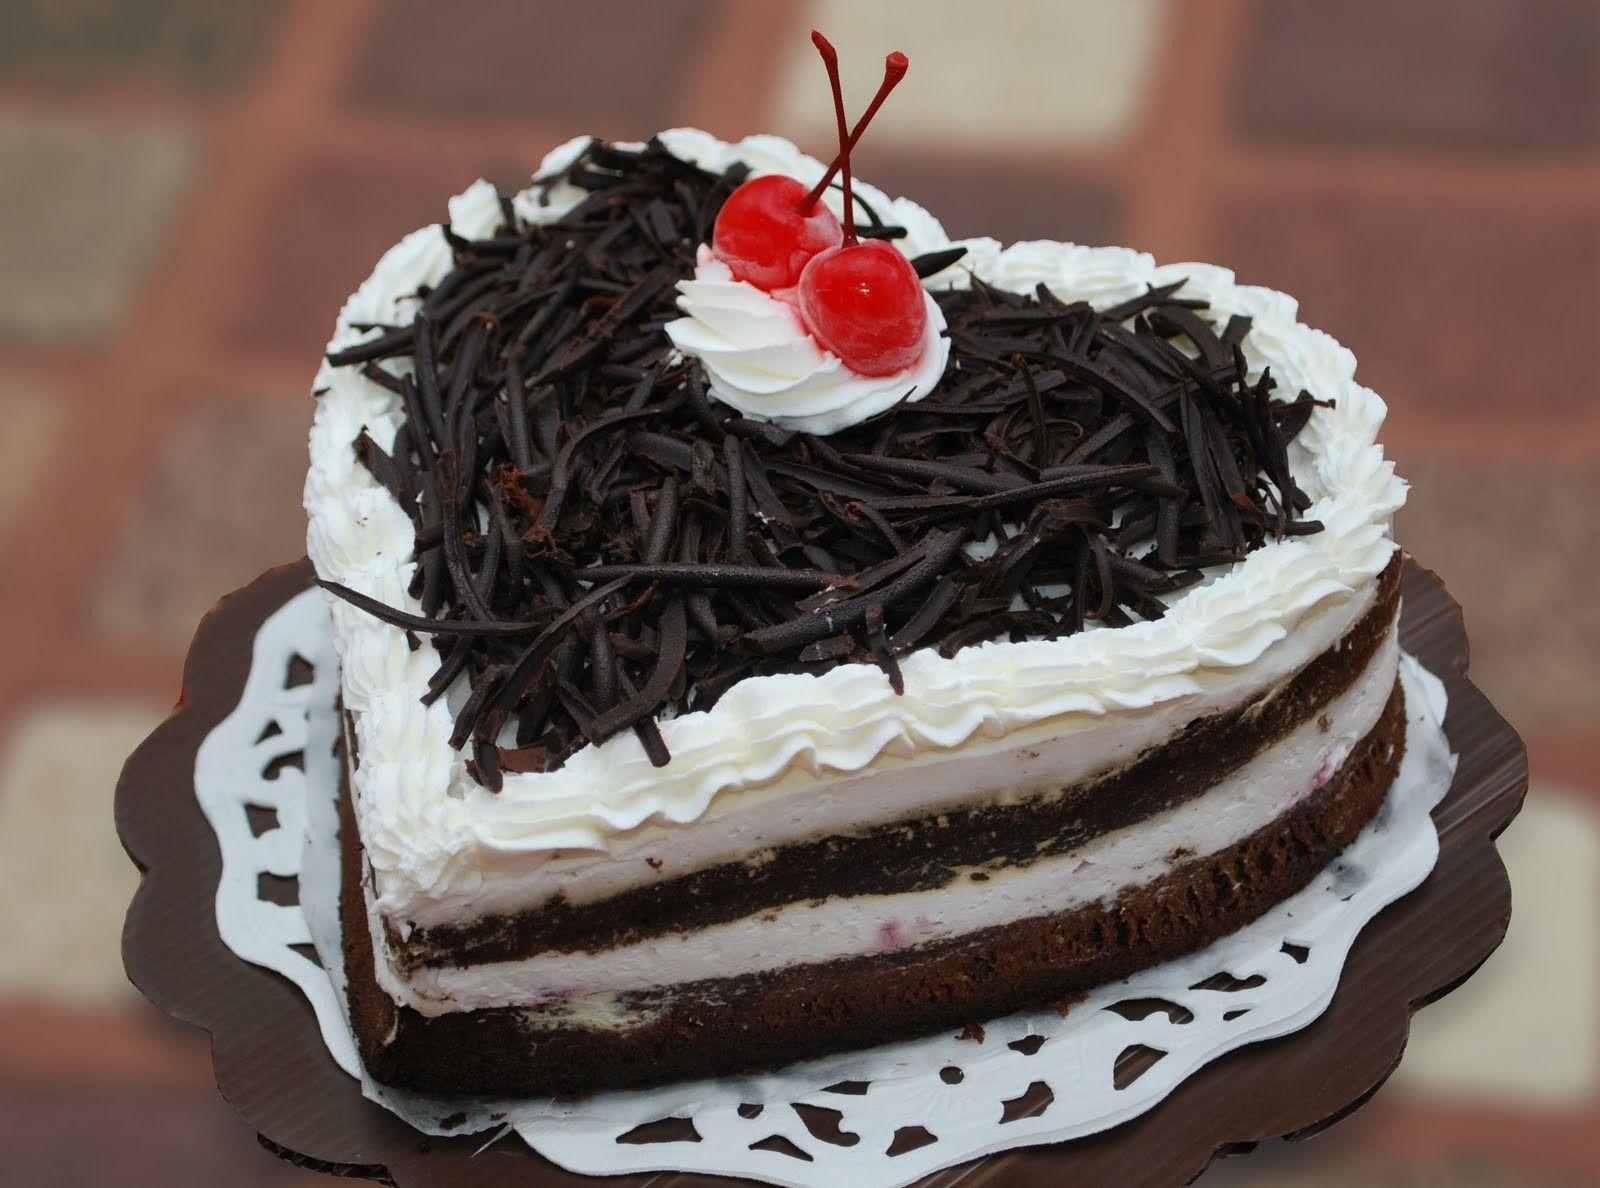 heart_shape_black_forest_cake 1 600×1 188 pixels | pastry